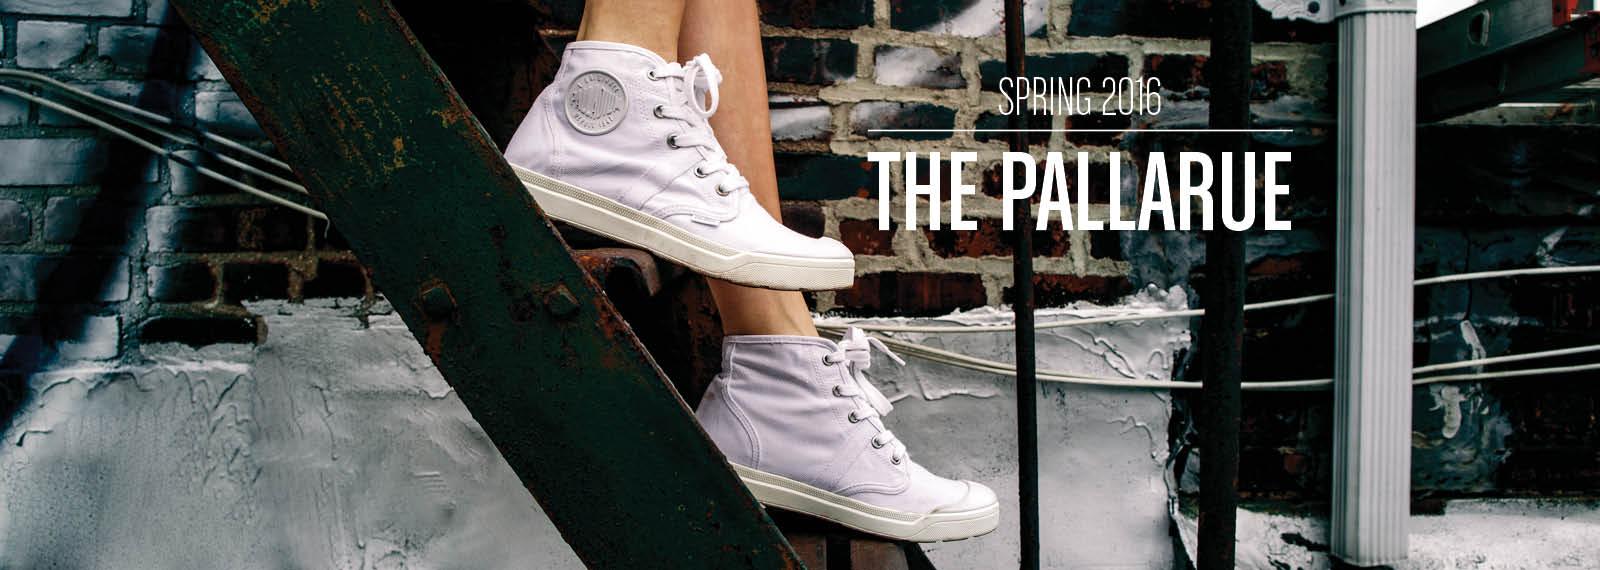 SPRING 2016 - THE PALLARUE